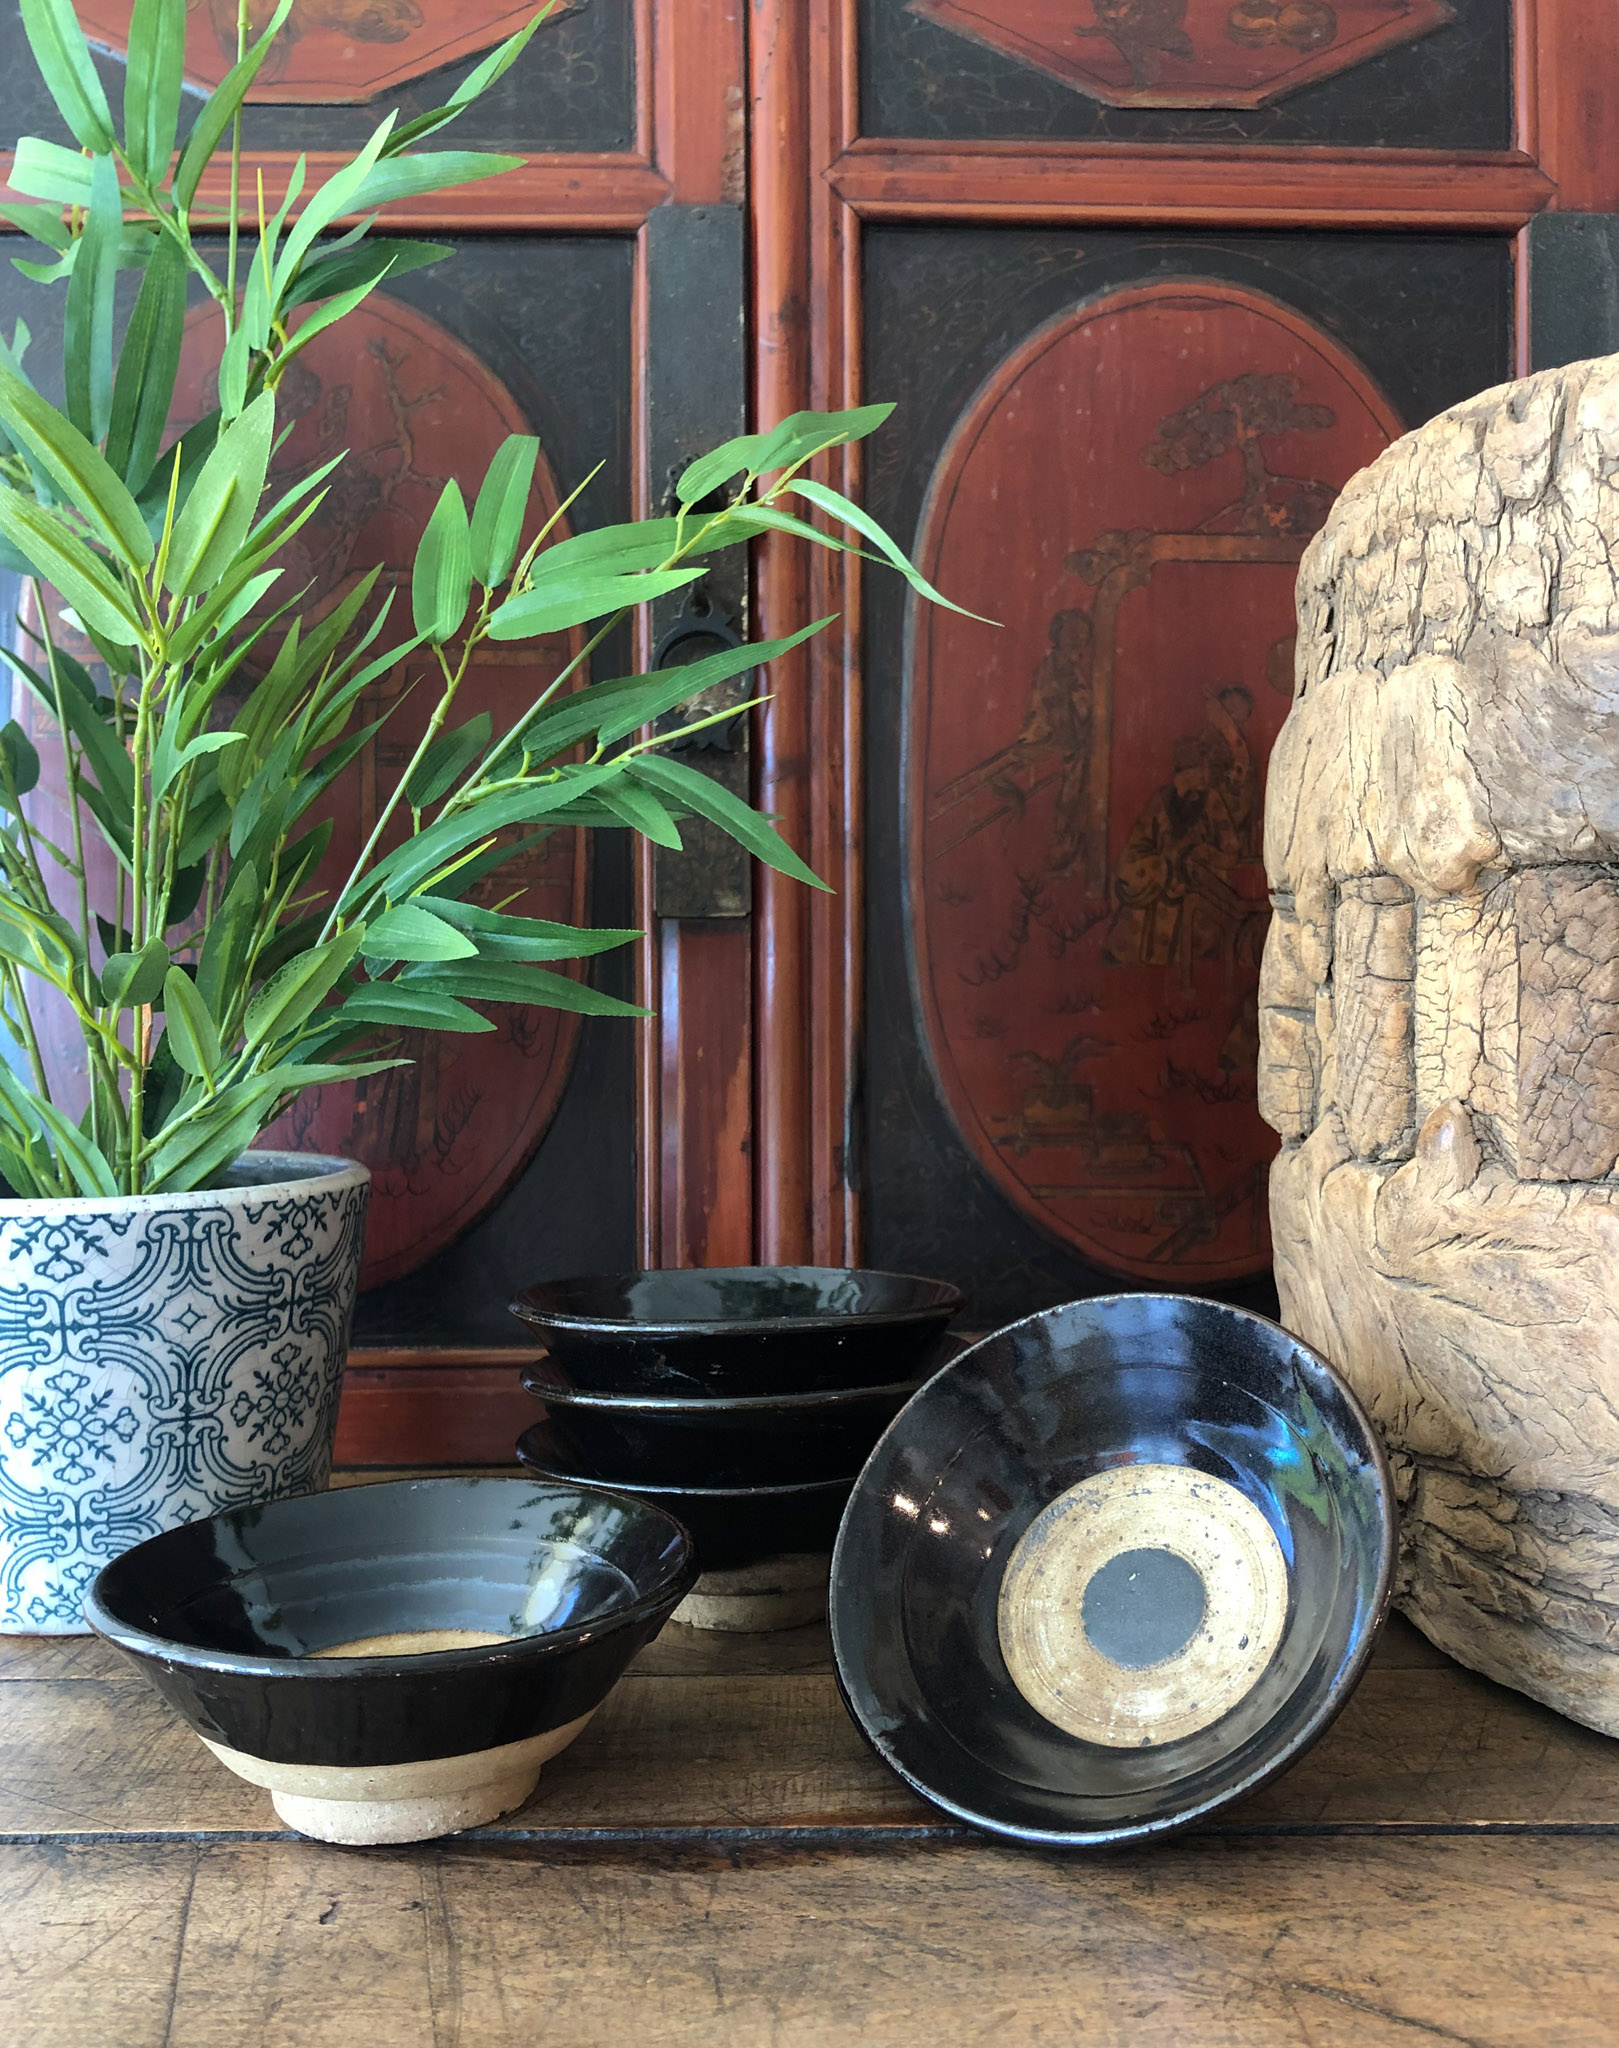 Vintage Chinese Tea Bowls